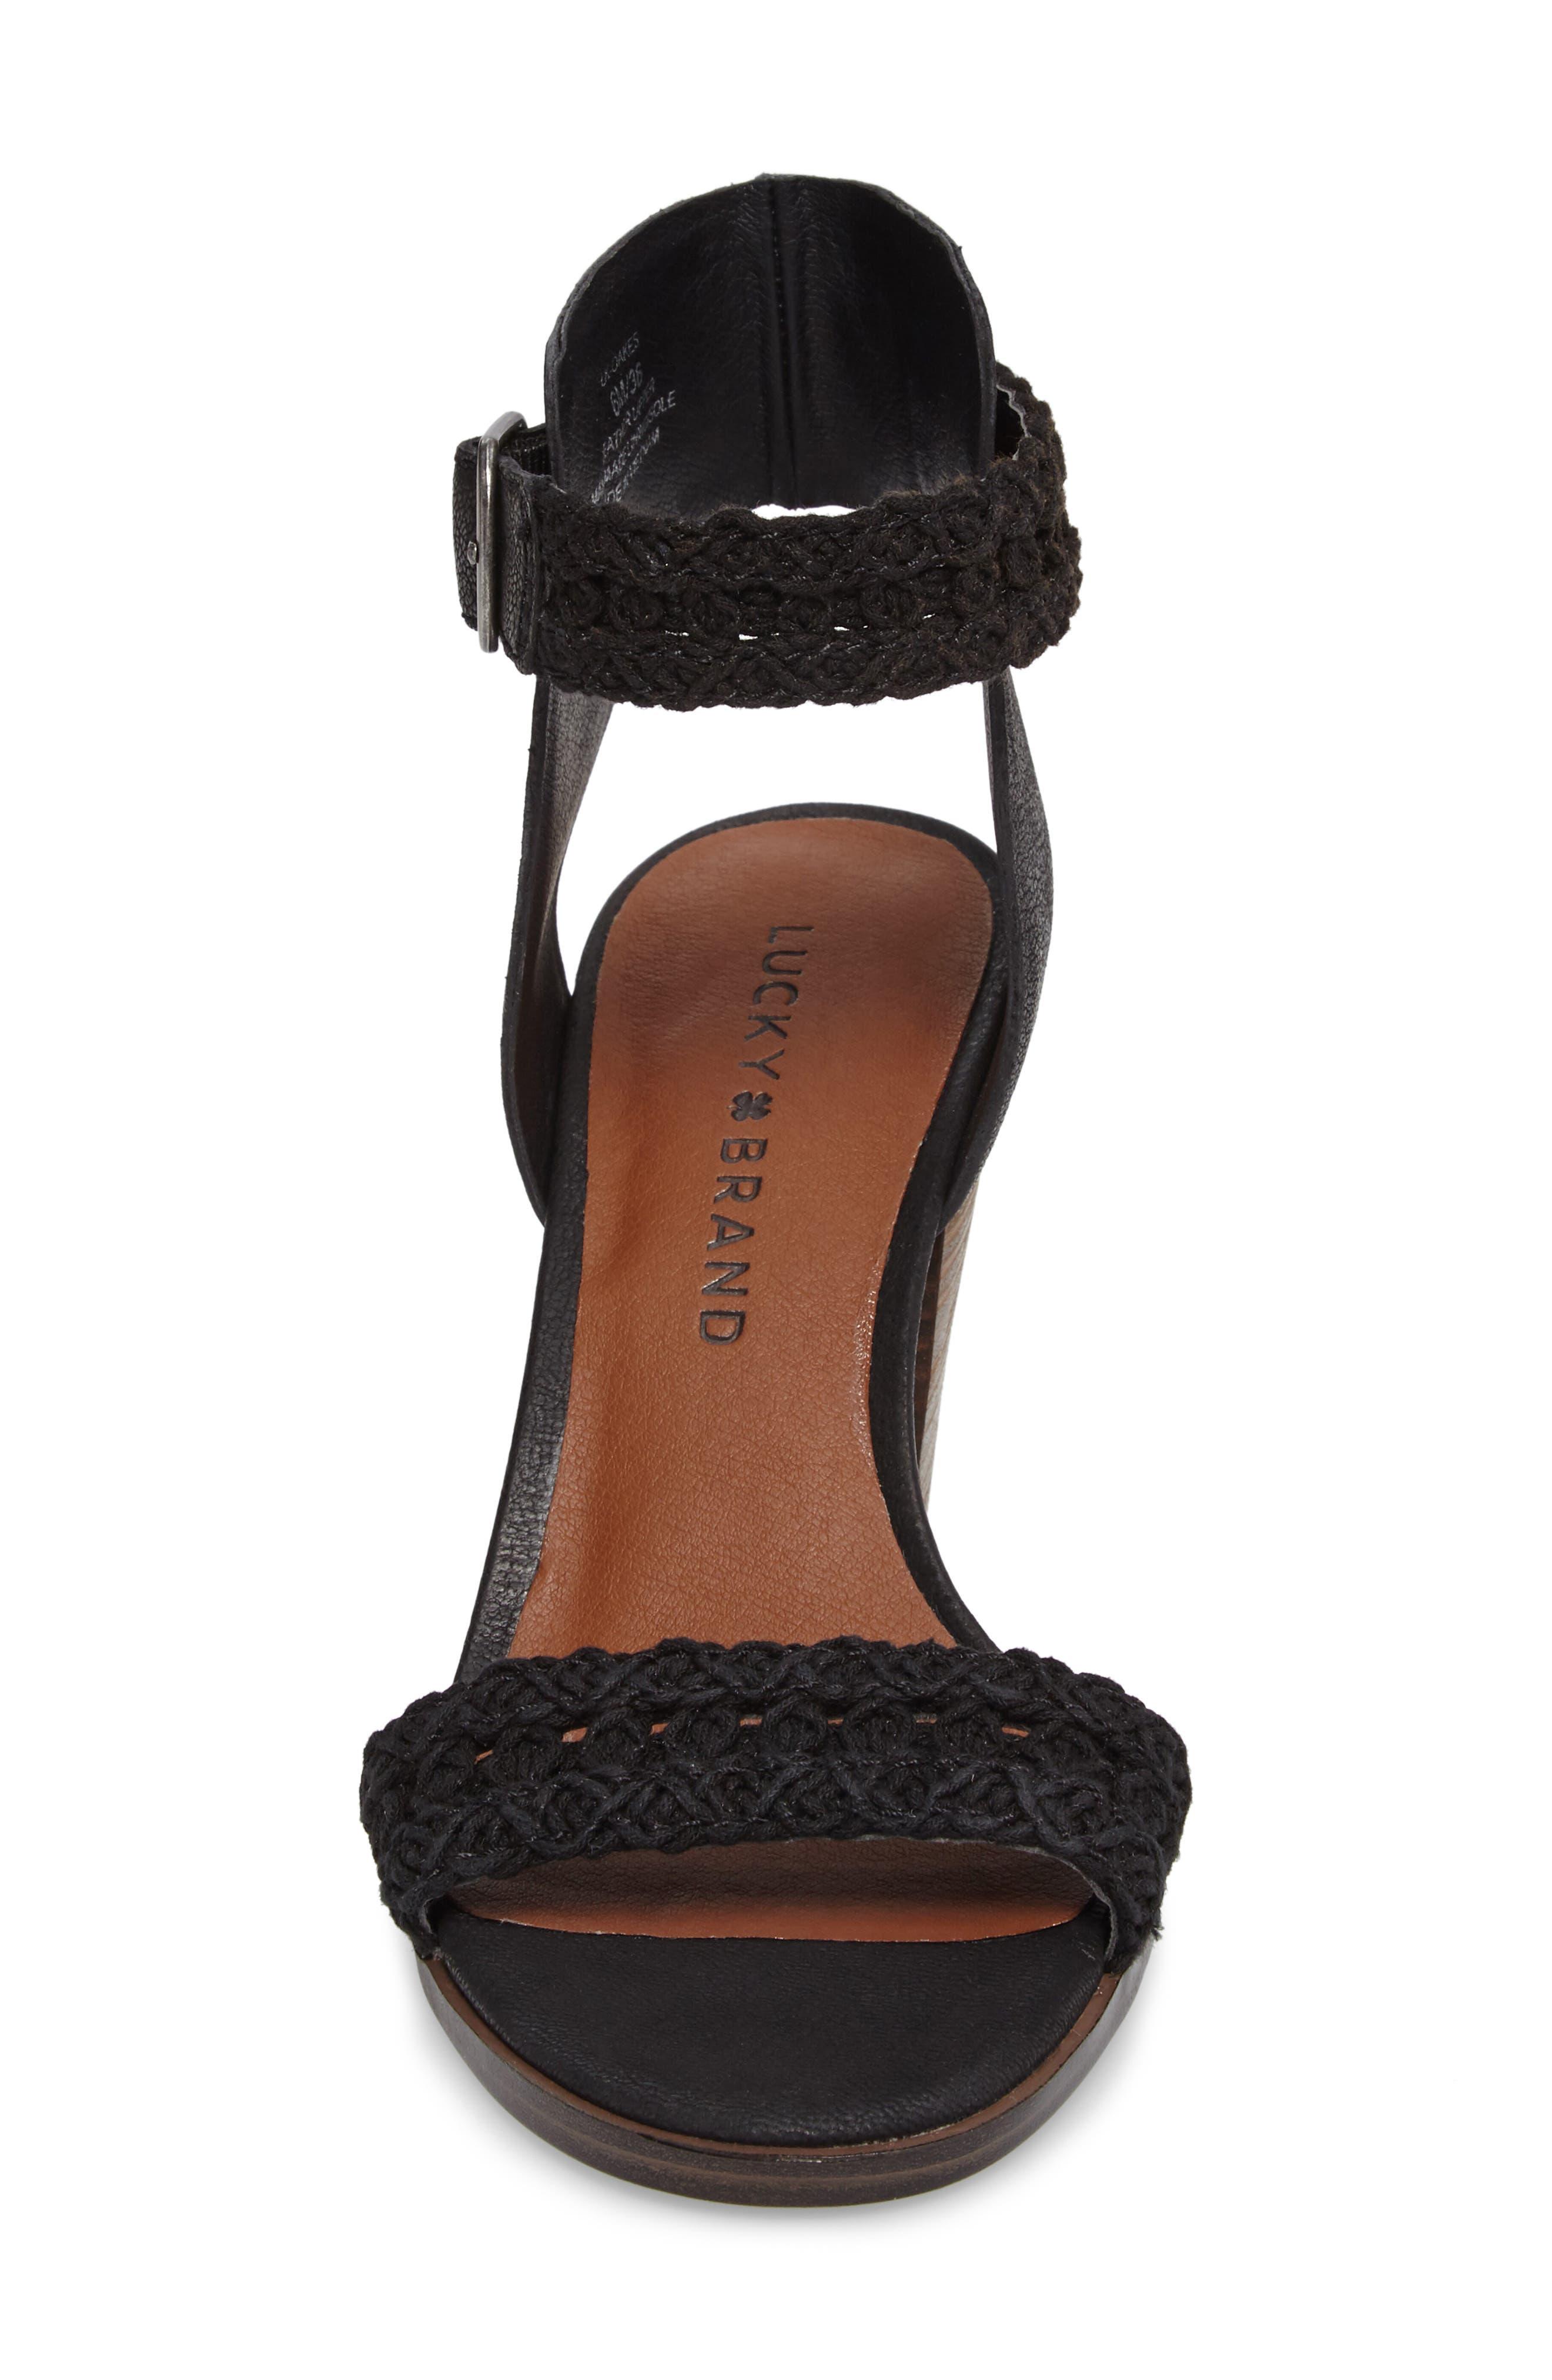 Oakes Ankle Strap Sandal,                             Alternate thumbnail 4, color,                             001